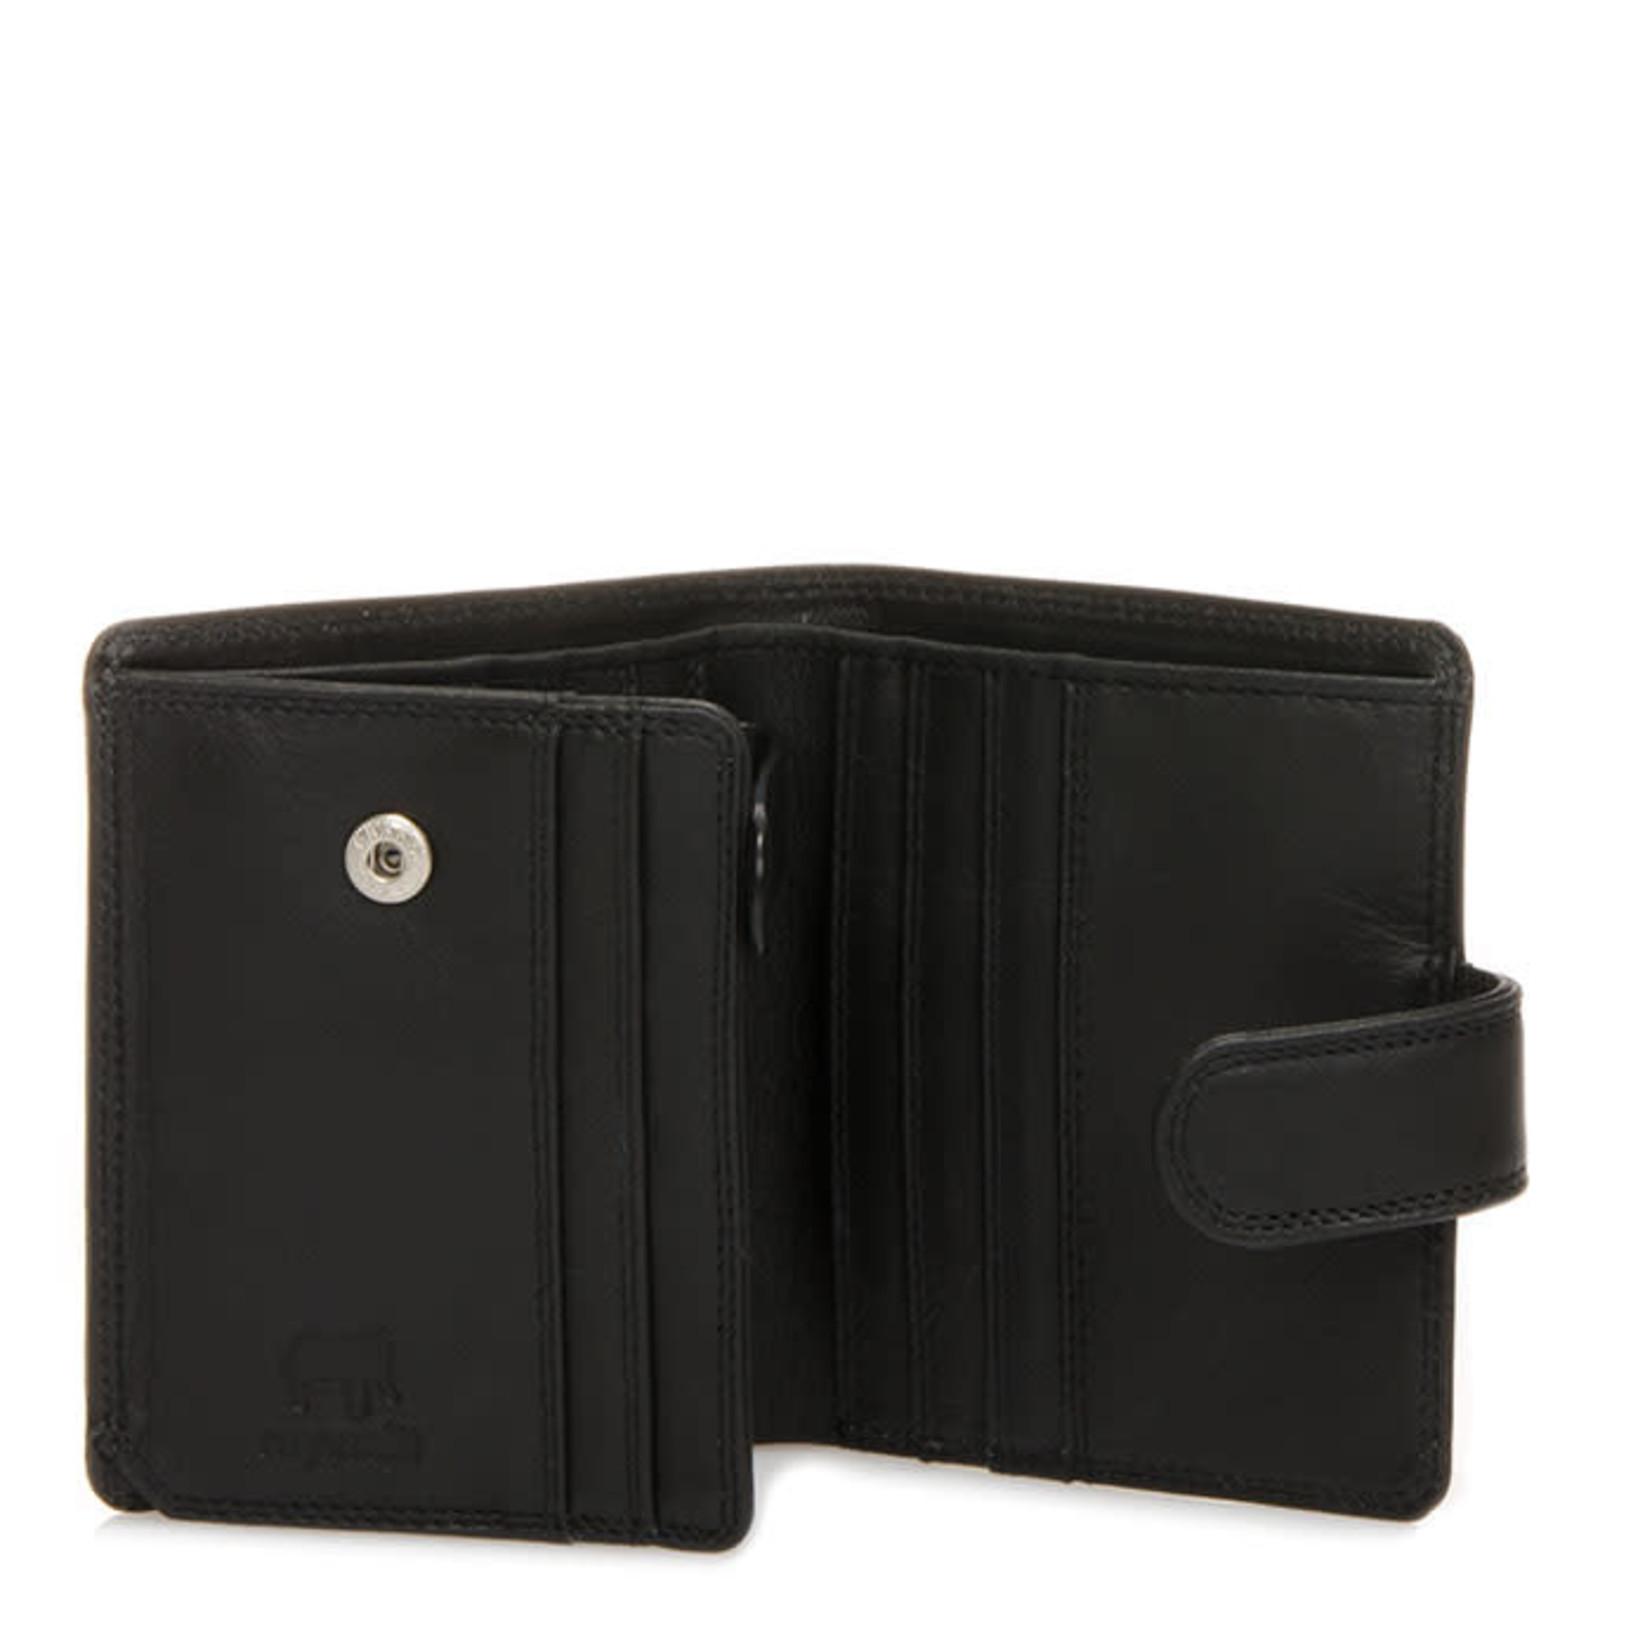 MyWalit Tri Fold Tab Wallet Black